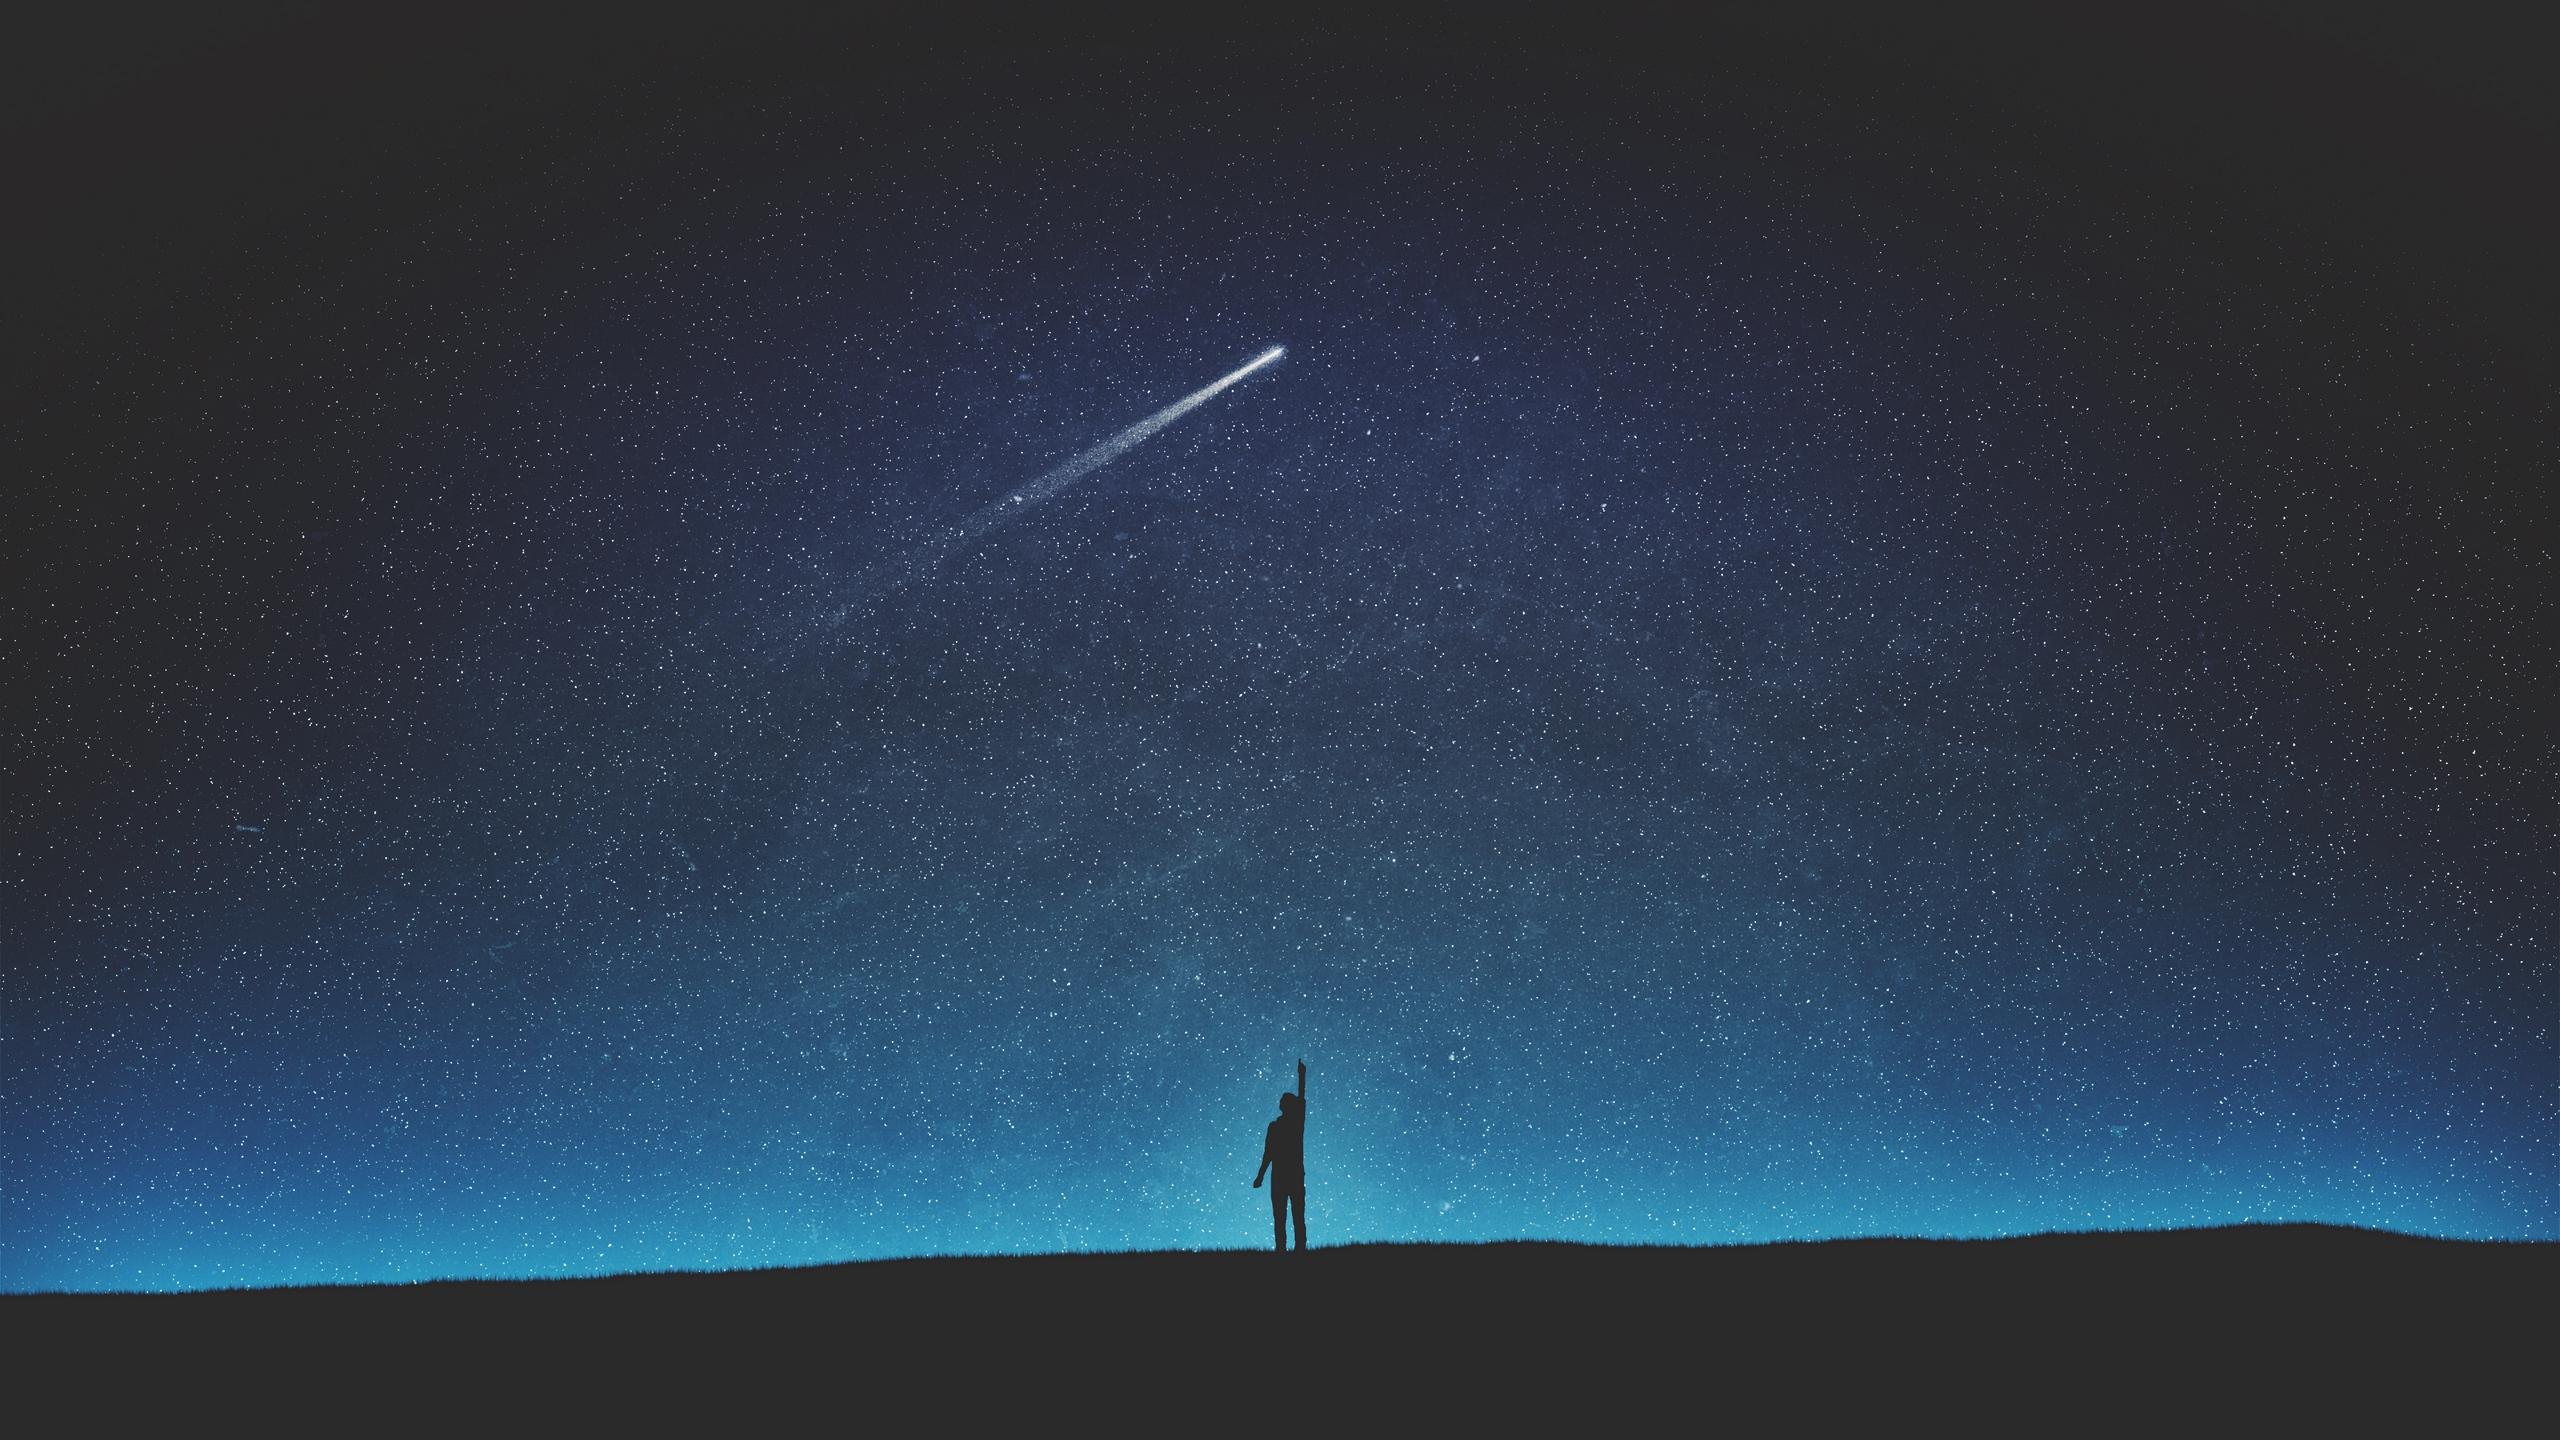 Wallpaper Digital Art Artwork Comet Night Sky Starry Night Skyscape Silhouette Dark Blue Black Looking Up Night View Shooting Stars 2560x1440 Soheibben 1613017 Hd Wallpapers Wallhere